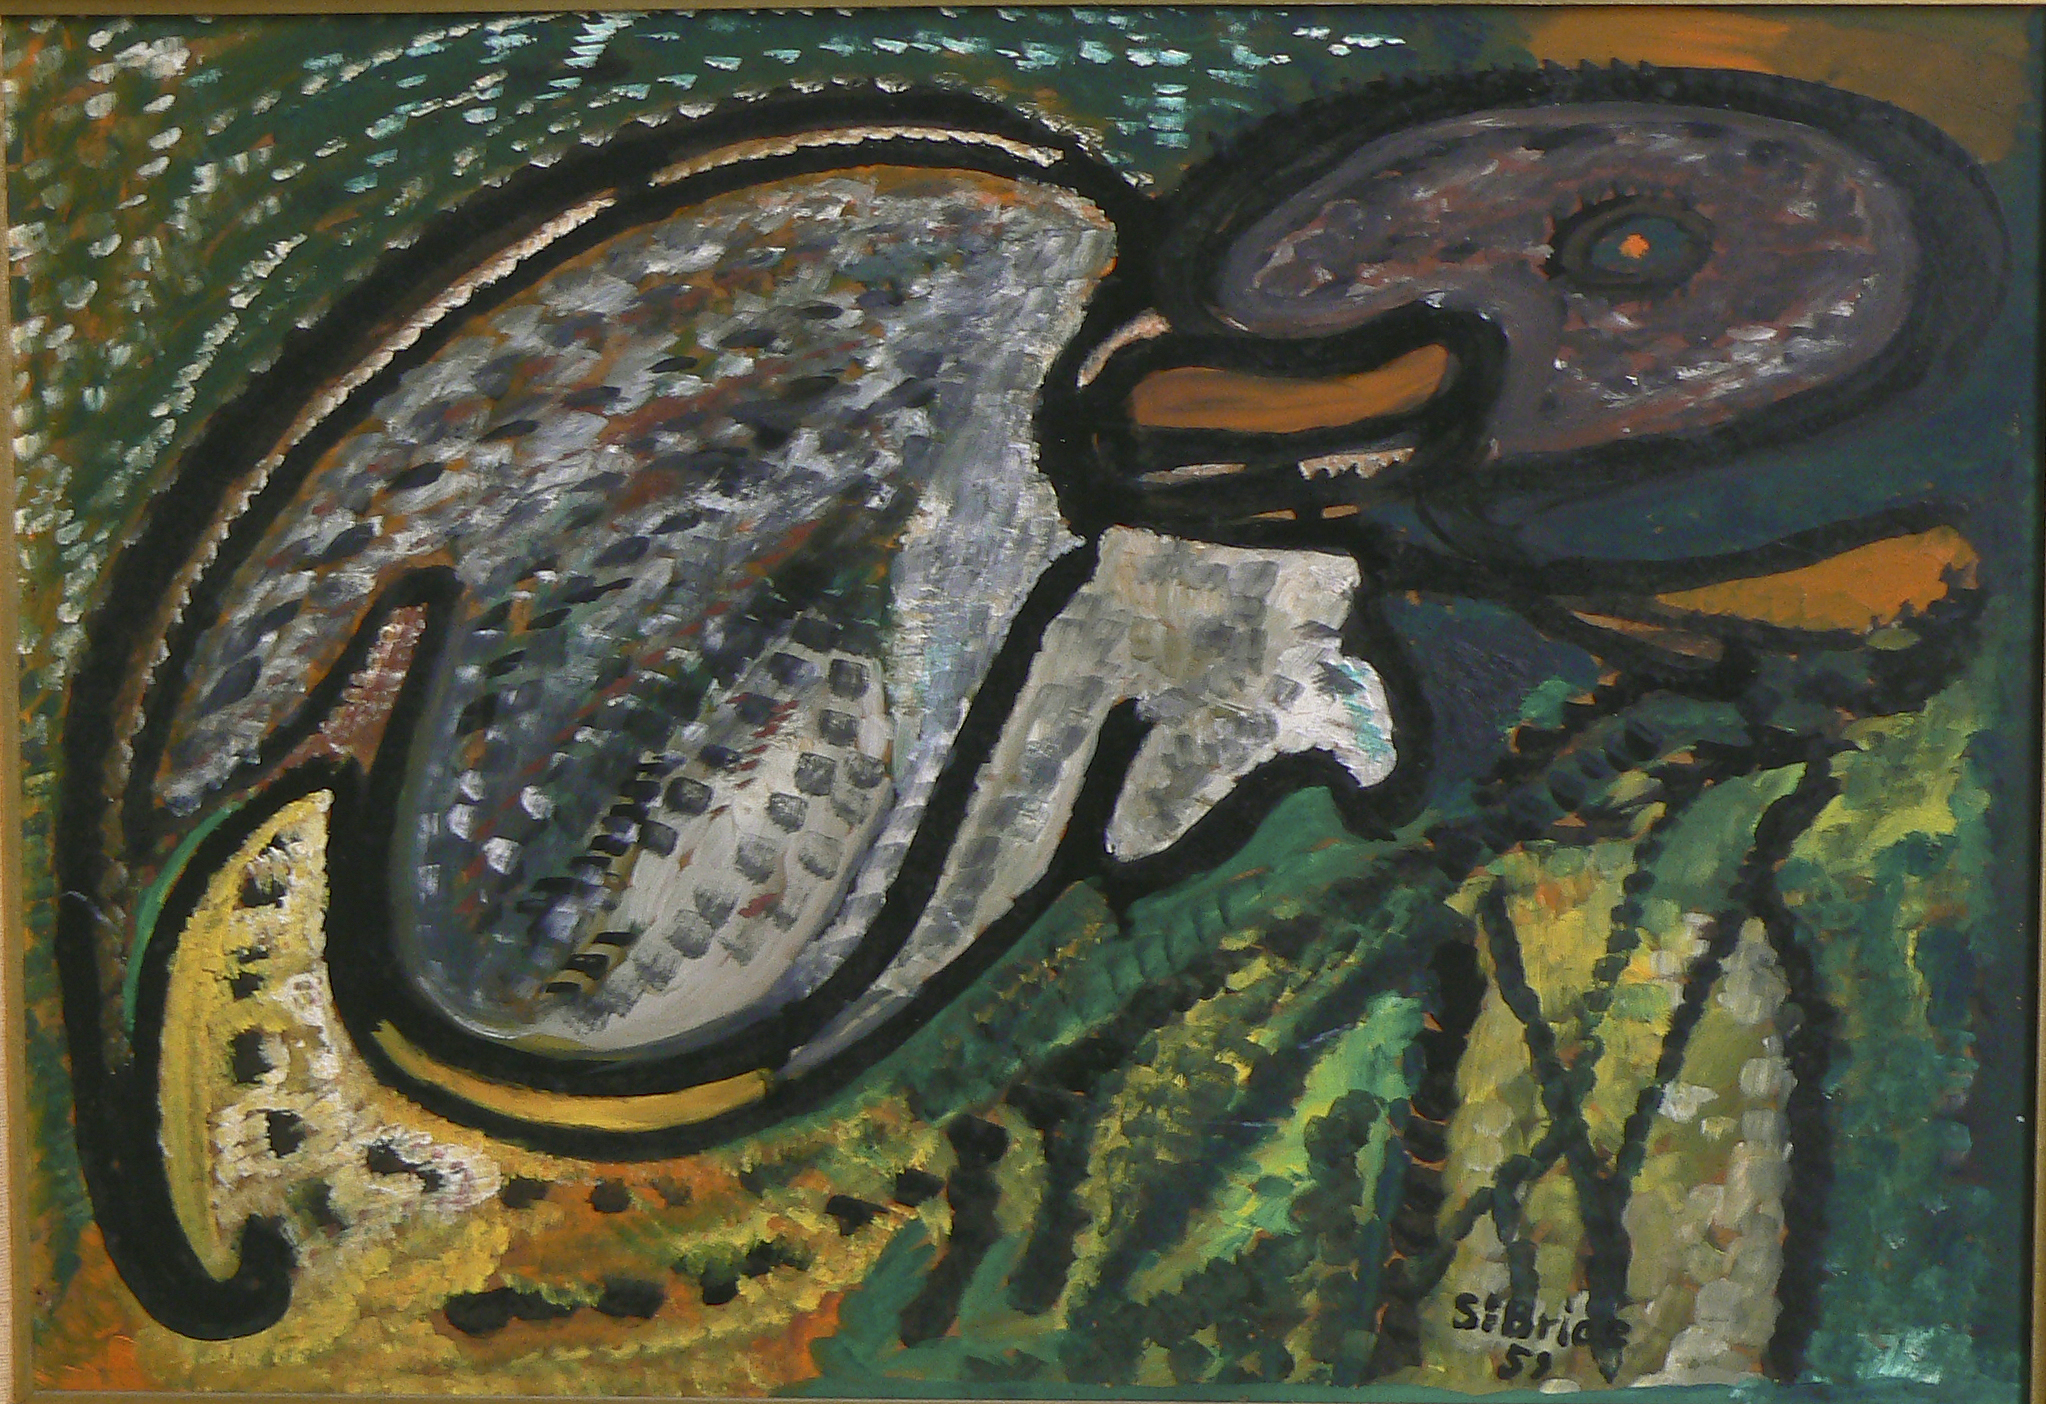 Robert St. Brice, Monkey , 1959, Oil on masonite, 14h x 20.5w in.